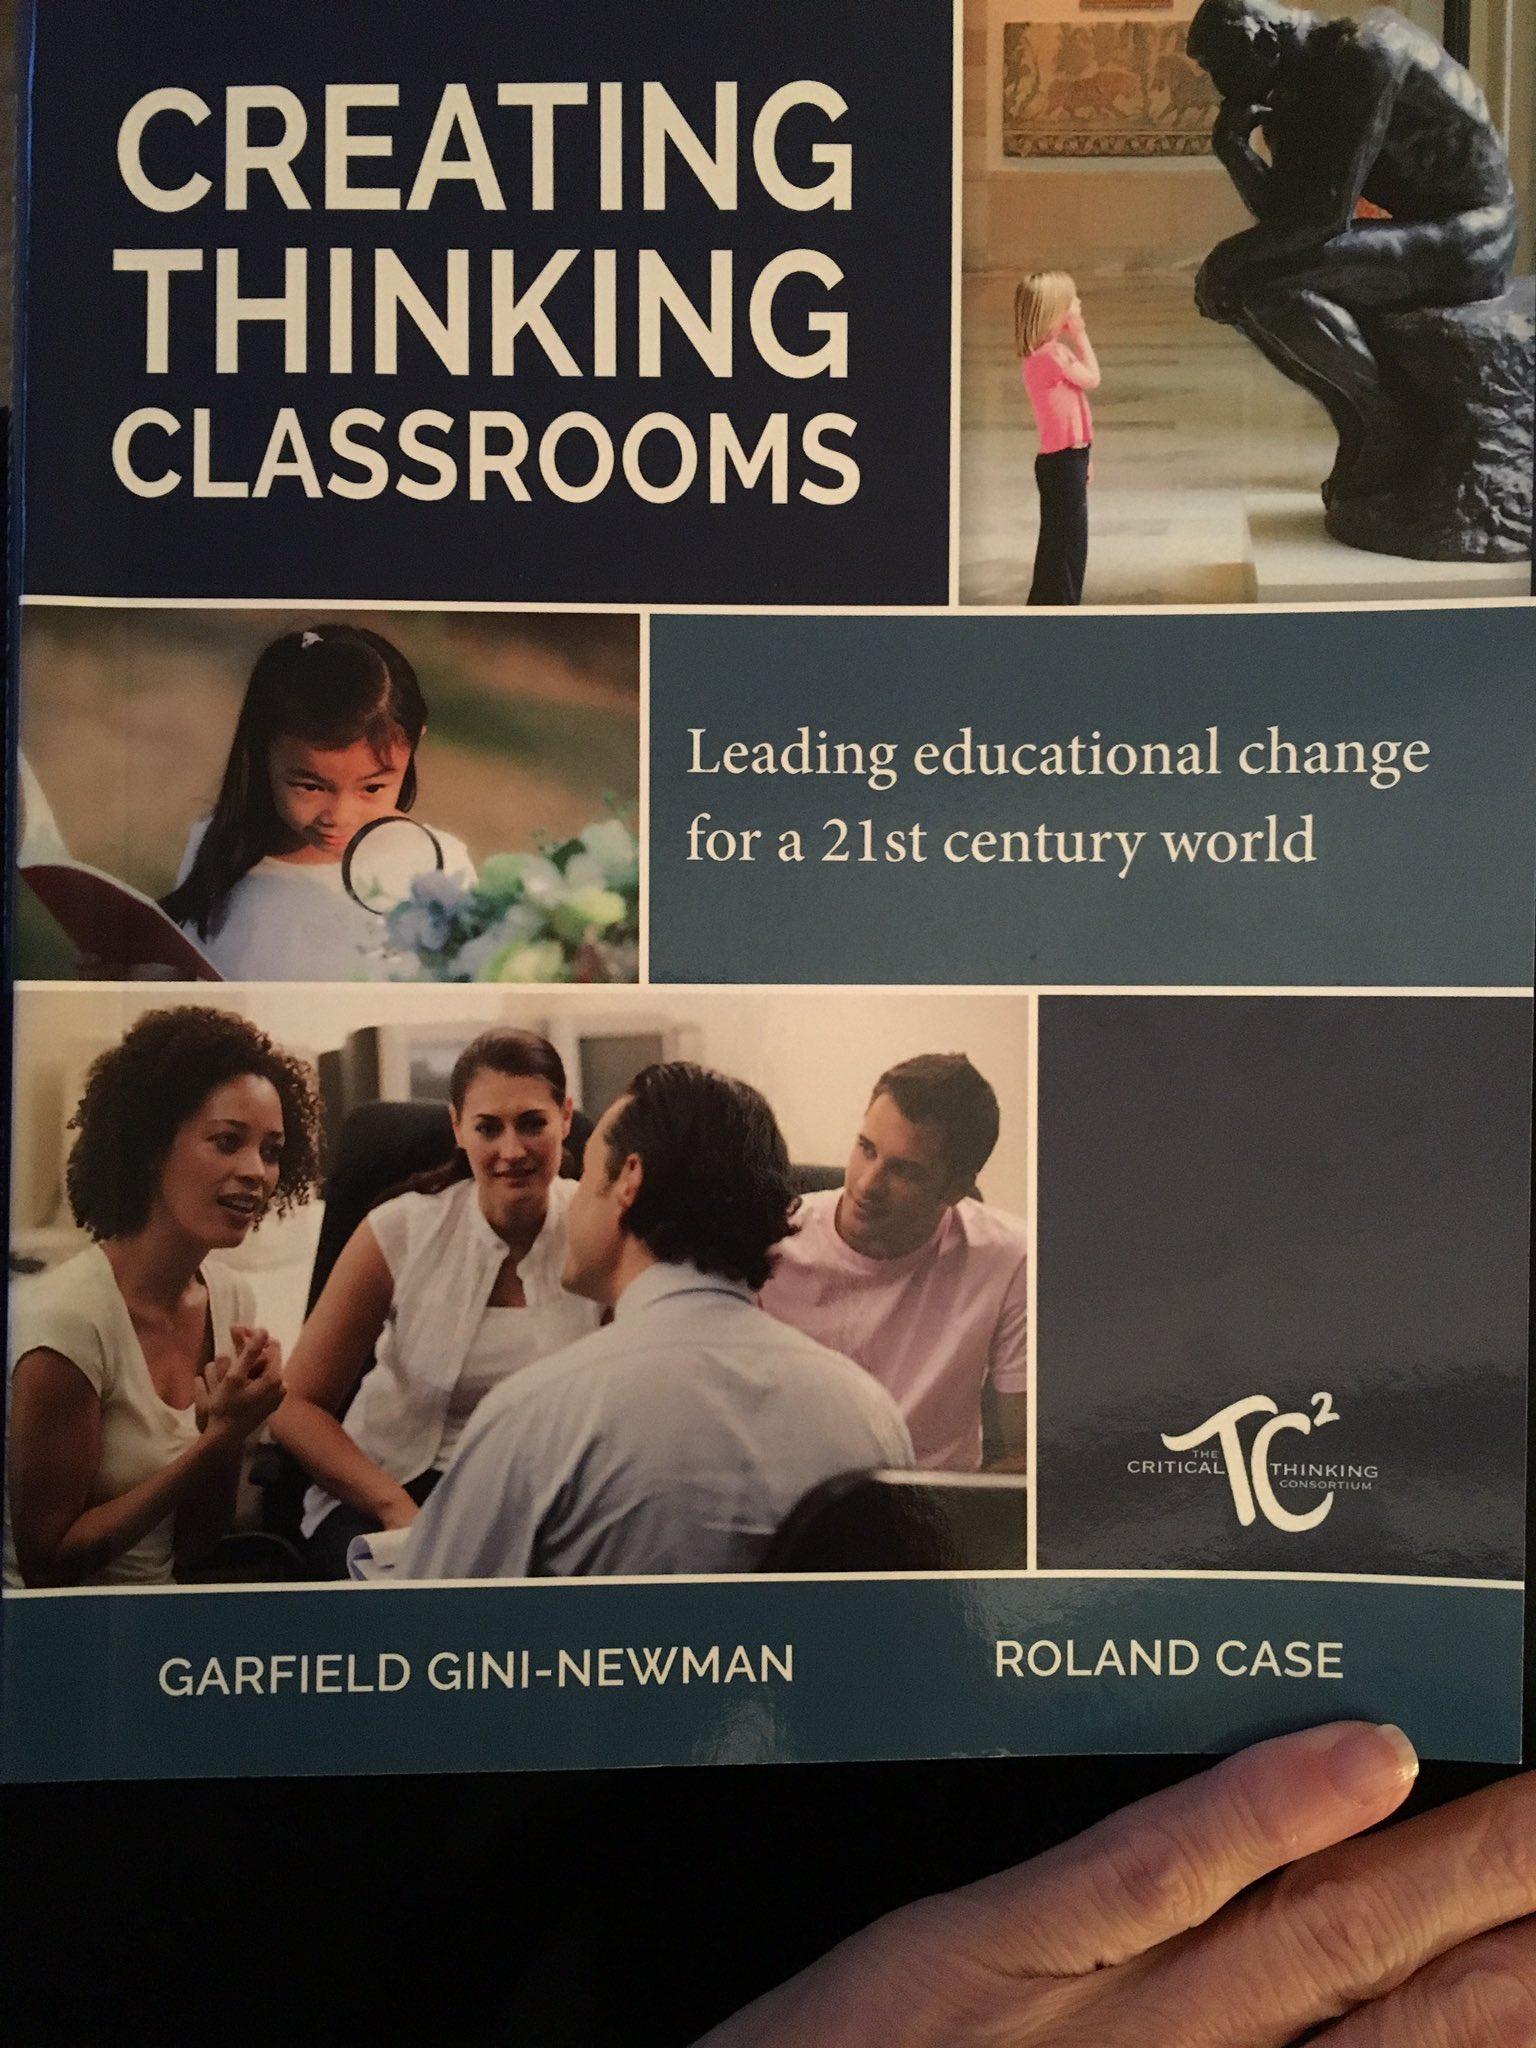 Starting the @SGDSBoard #summer #reading #ThinkingClassrooms @ggininewman #RolandCase @TC2thinks @UshaJames #ltelt @NIckiMC40 https://t.co/whNgrd5hRa